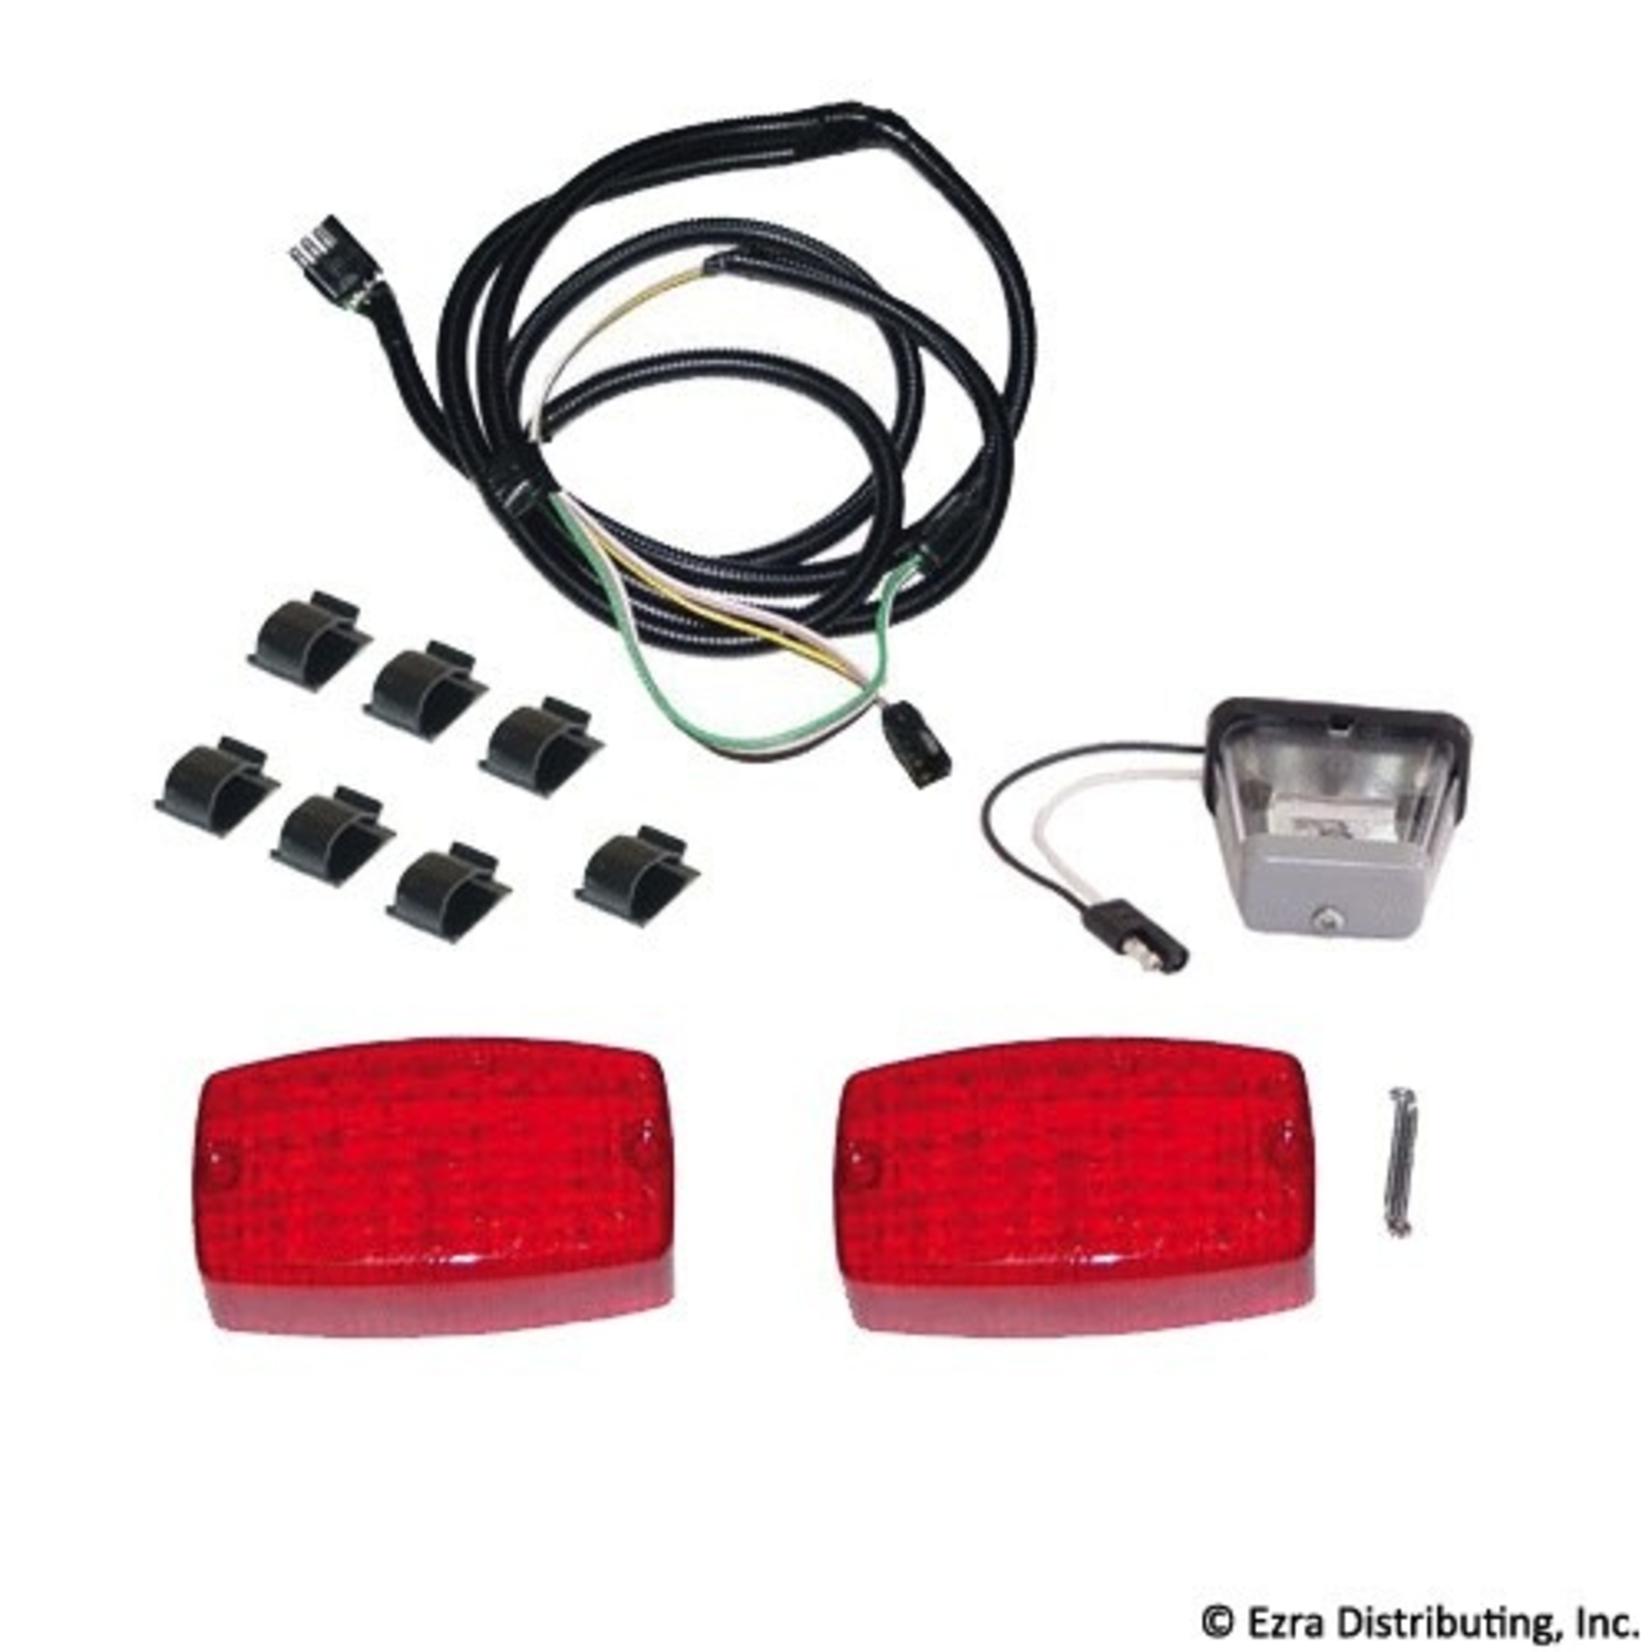 Accessories Versa Haul Tail Light Kit w/Licence light